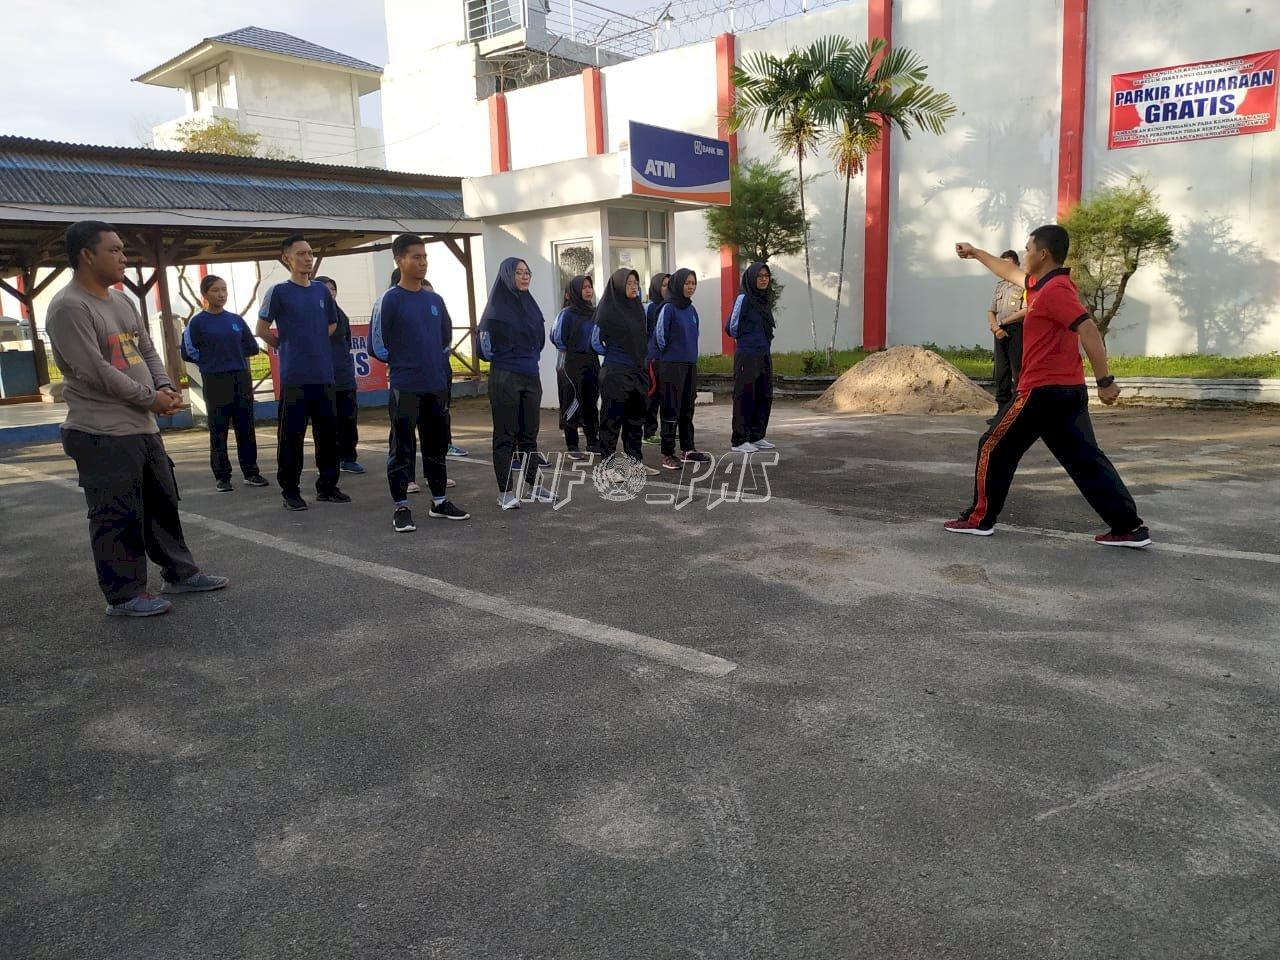 Baris-Berbaris Jaga Fisik & Mental Tunas Pengayoman LPP Bandar Lampung